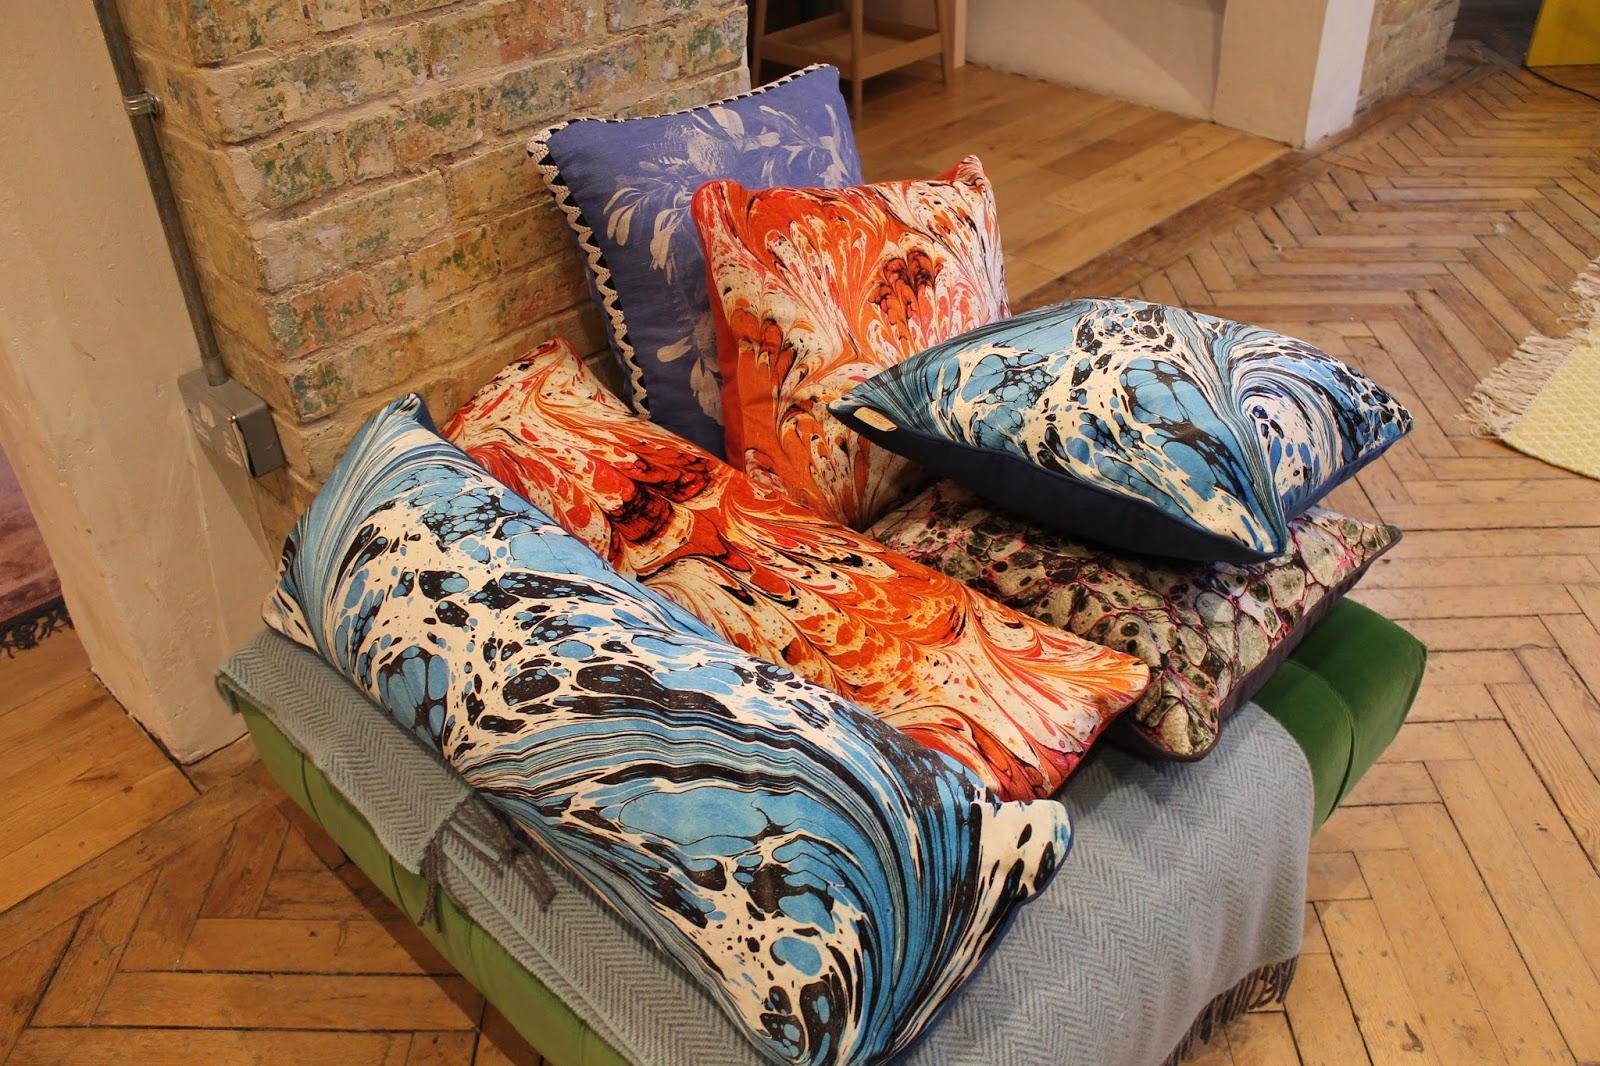 Fabrics and Soft Furnishing : IMG2421 from foodforcris.blogspot.com size 1600 x 1066 jpeg 471kB